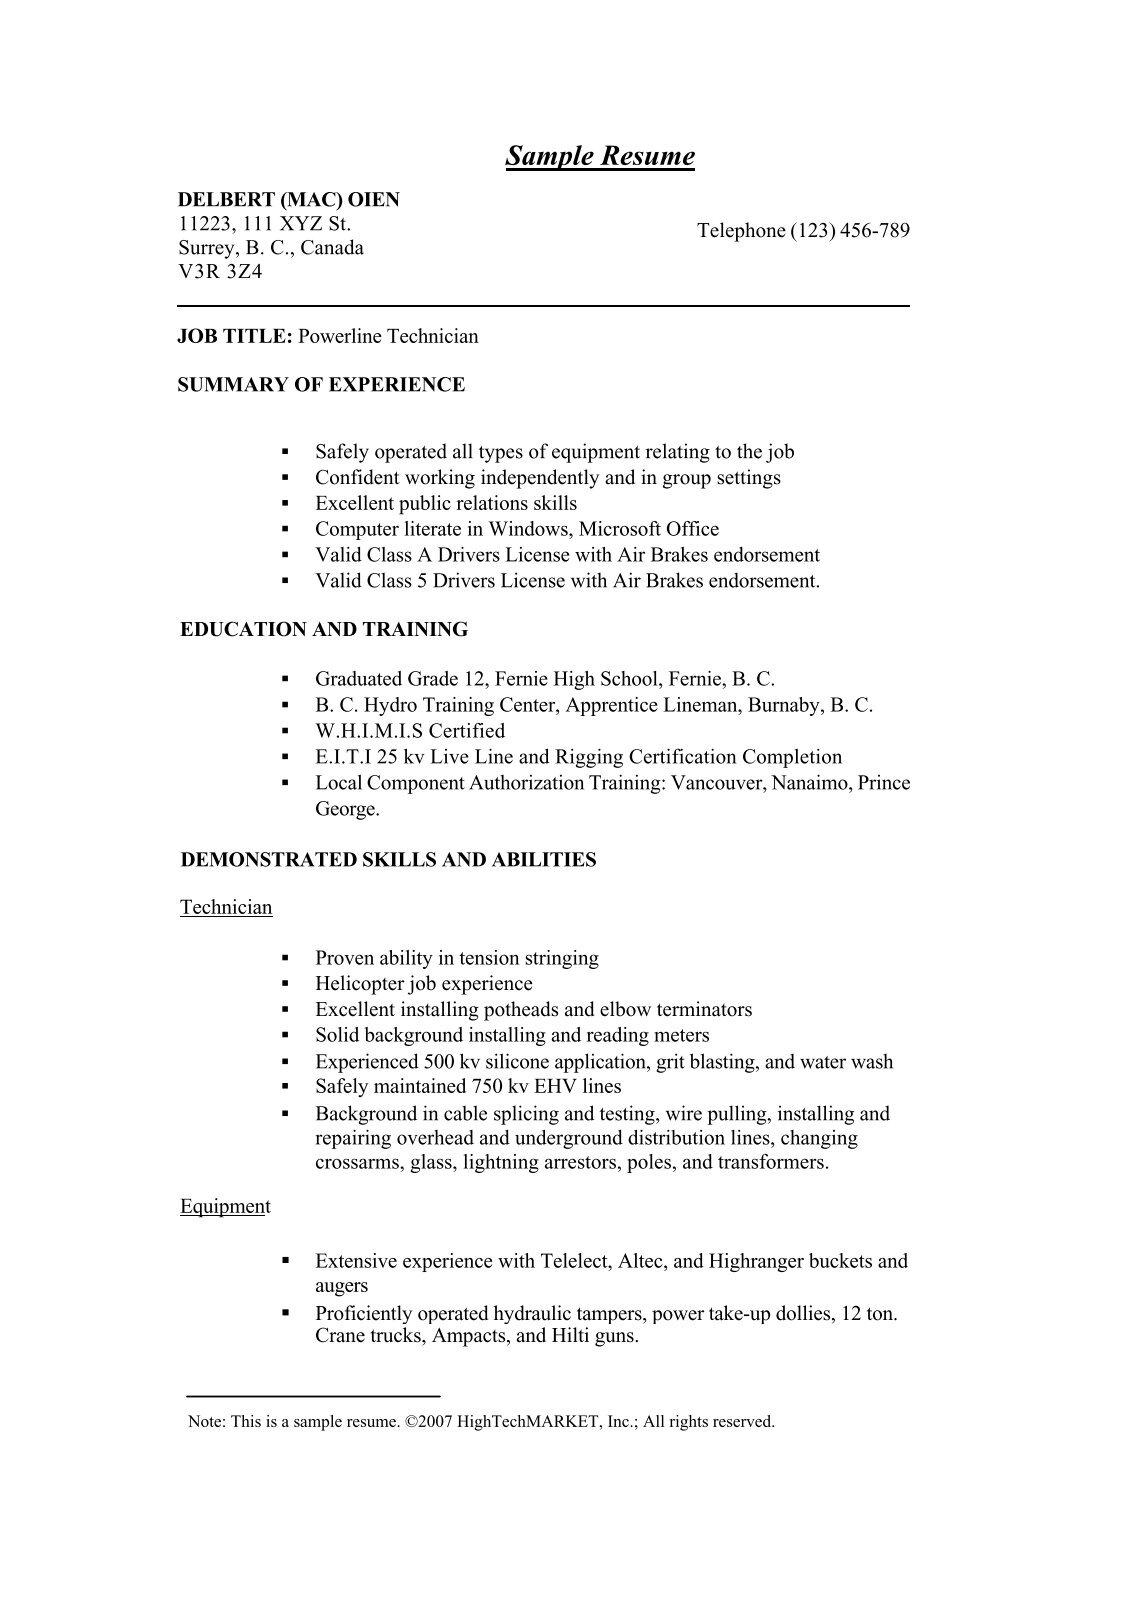 Ut Austin Transfer Essay  Custome Writing also Business Format Essay  Health Essay Example